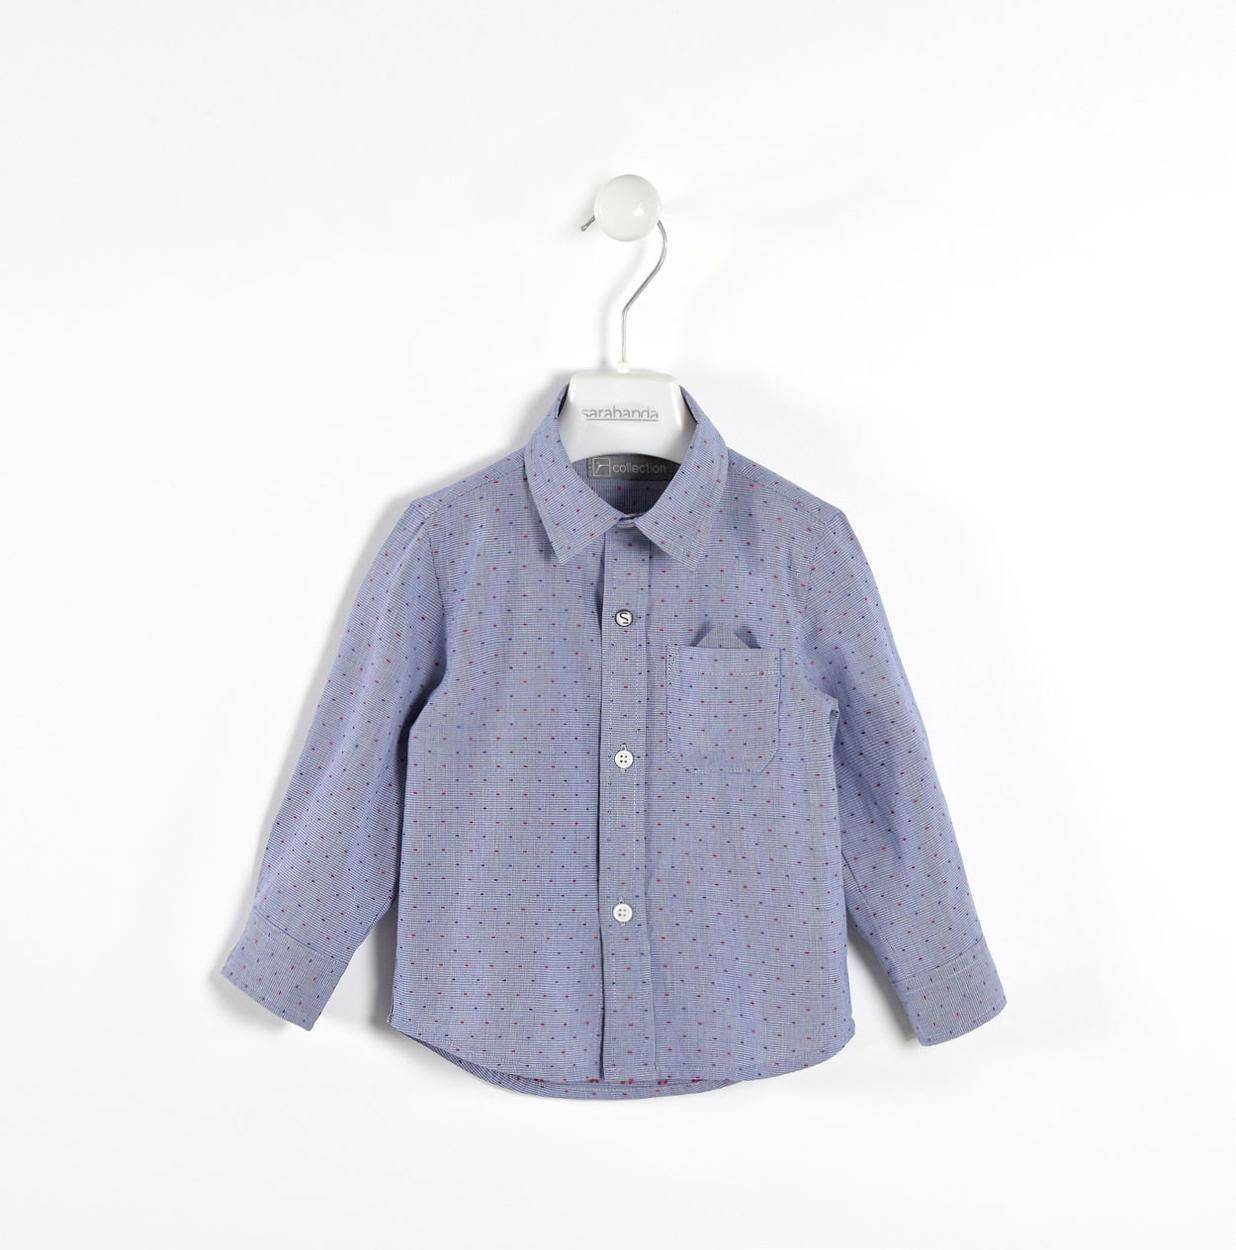 detailed look 27810 f6def Elegante camicia 100% cotone per bambino da 6 mesi a 7 anni Sarabanda